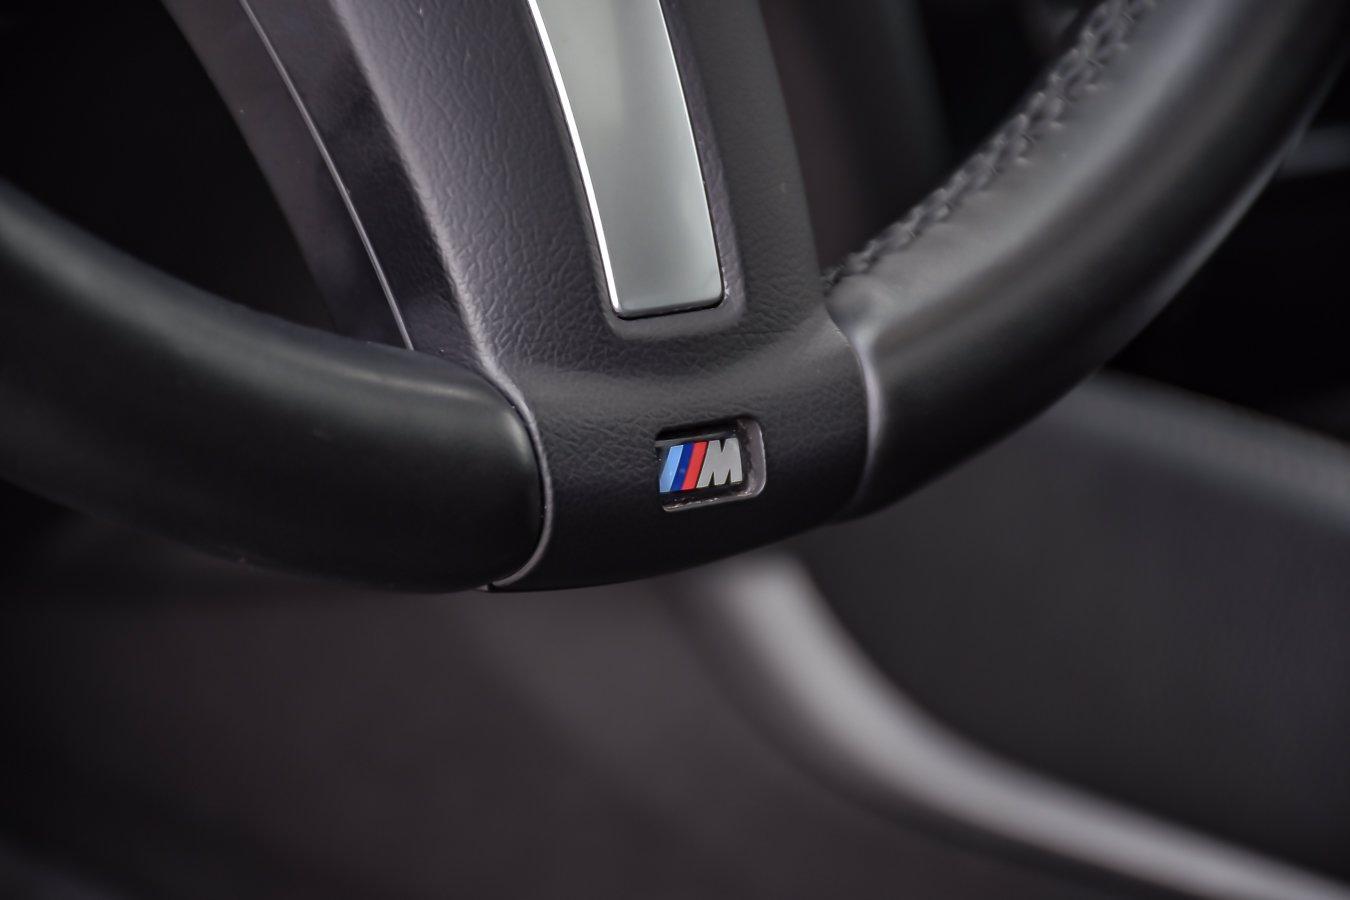 Used 2017 BMW X6 xDrive35i M-Sport Luxury Premium   Downers Grove, IL